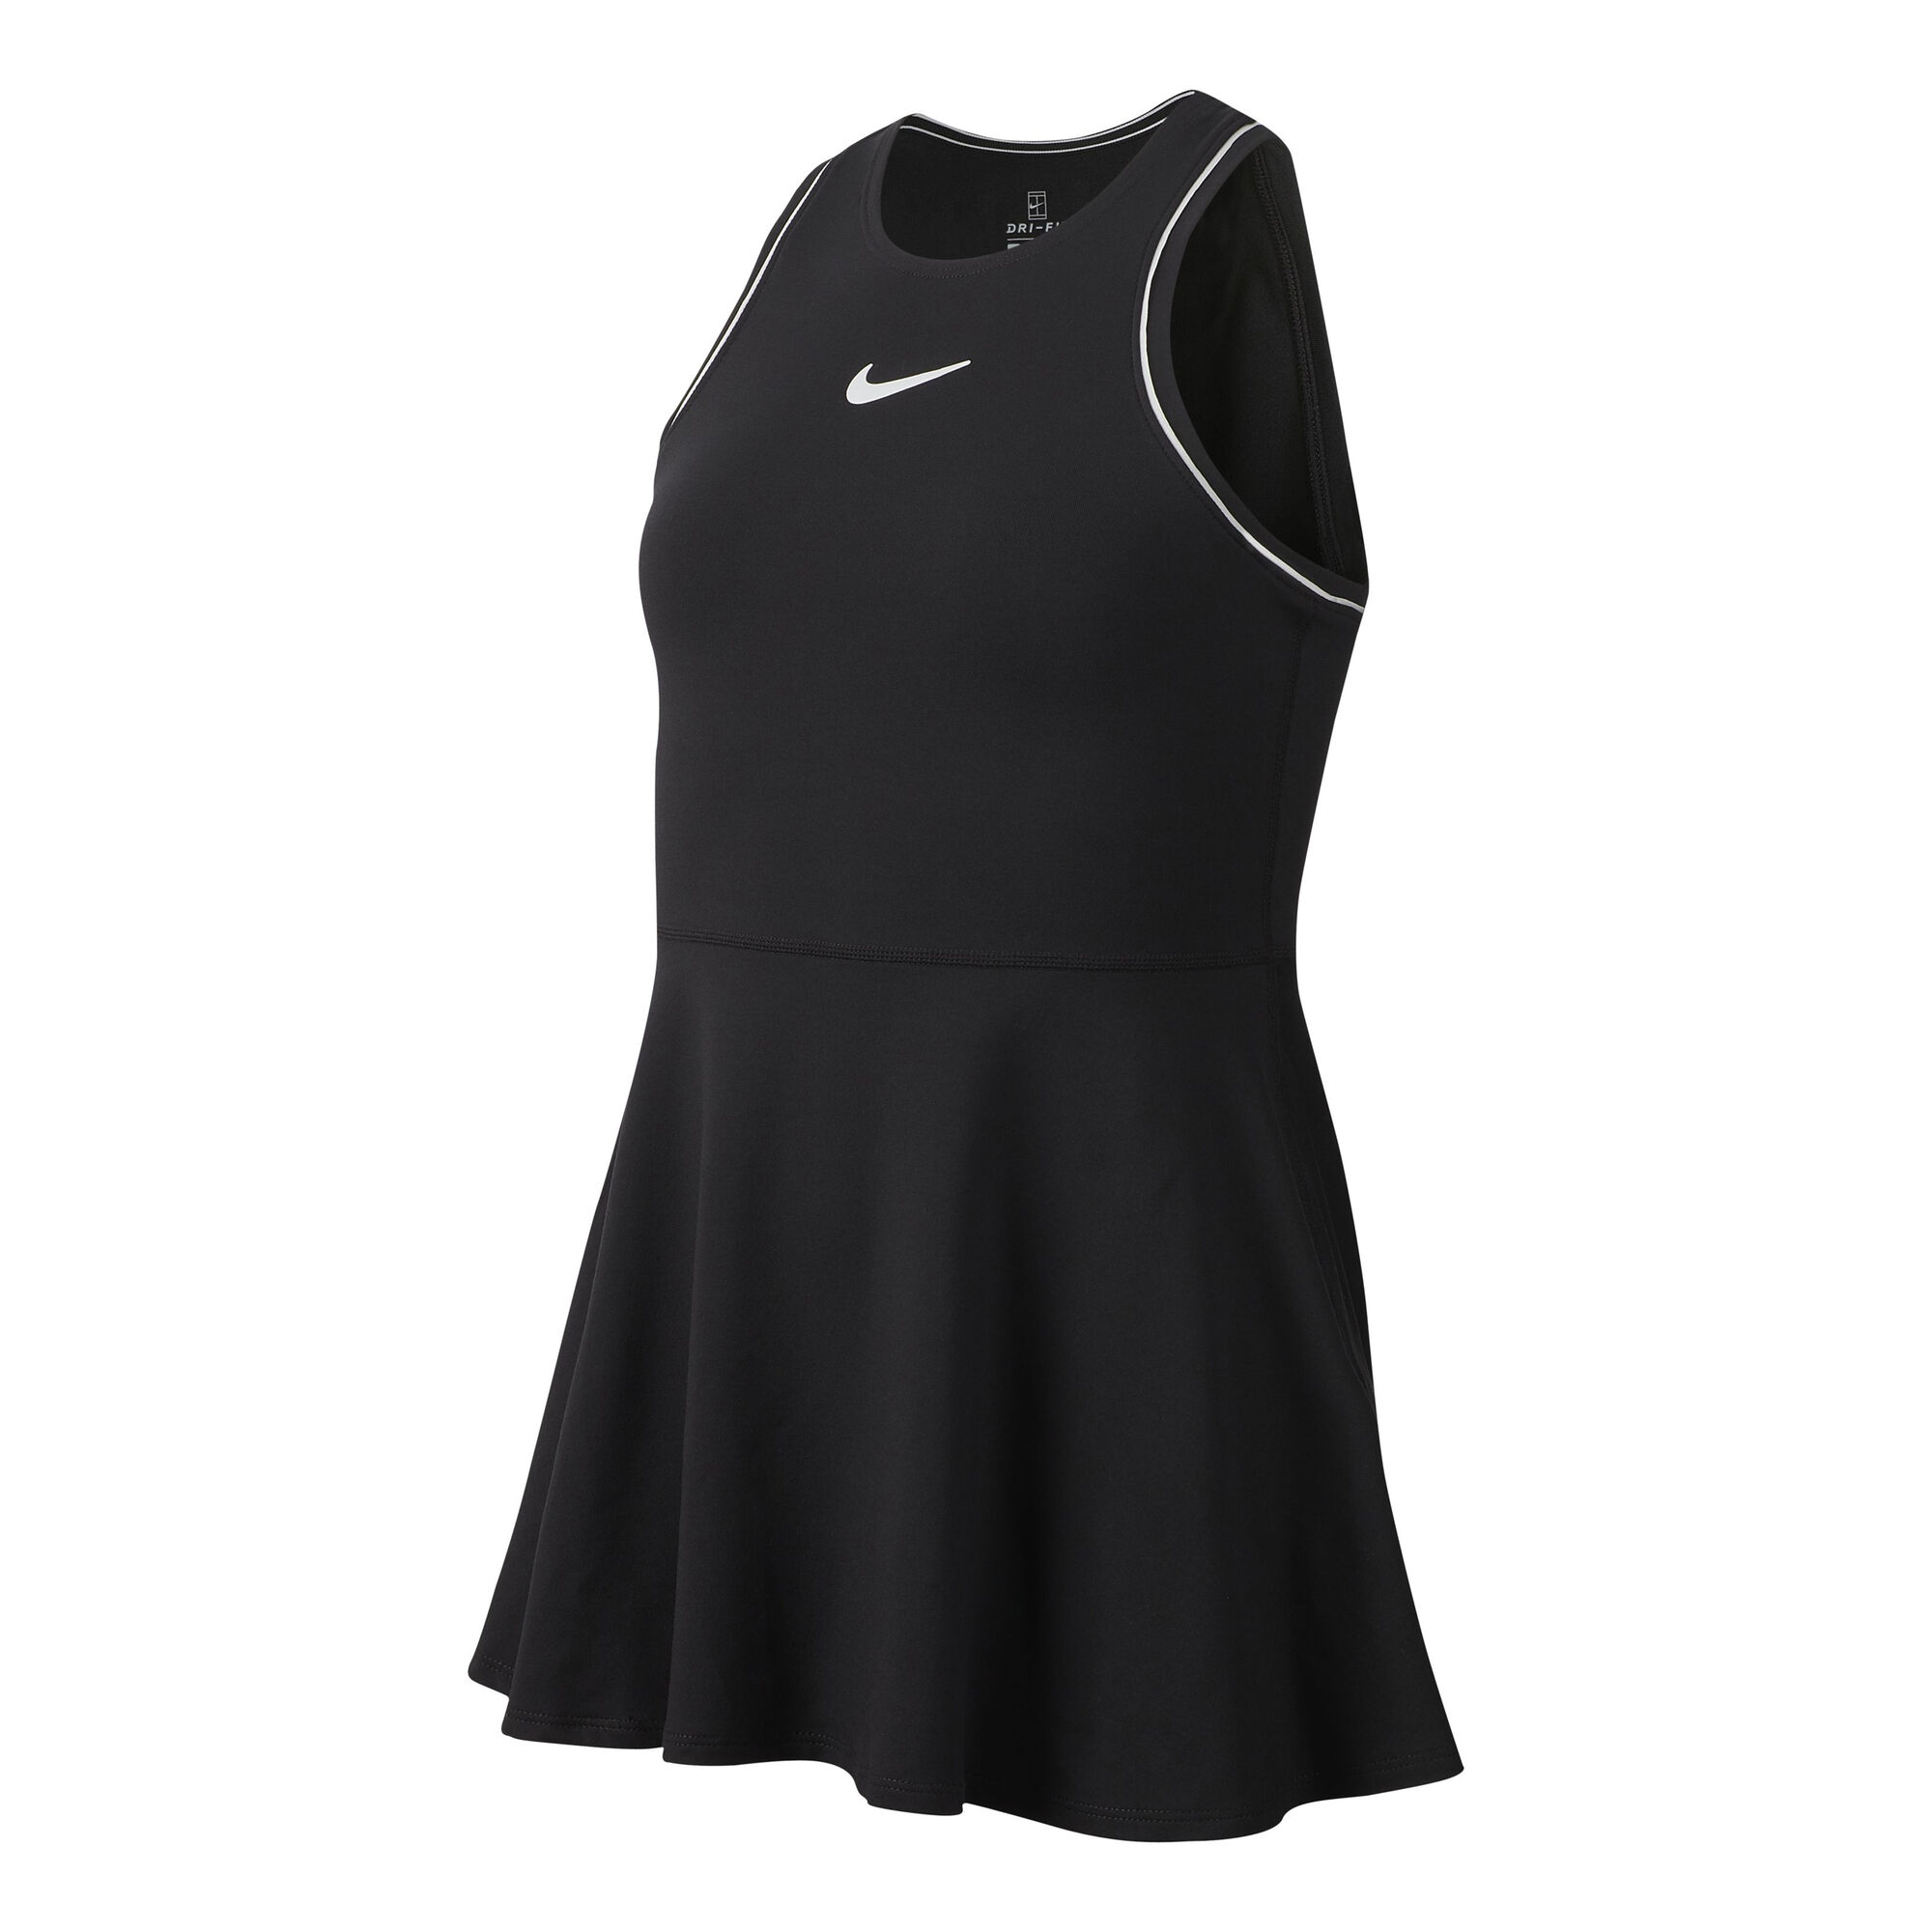 53bc6e4c4d7 Nike Court Dry Kjole Pige - Sort, Hvid køb online   Tennis-Point